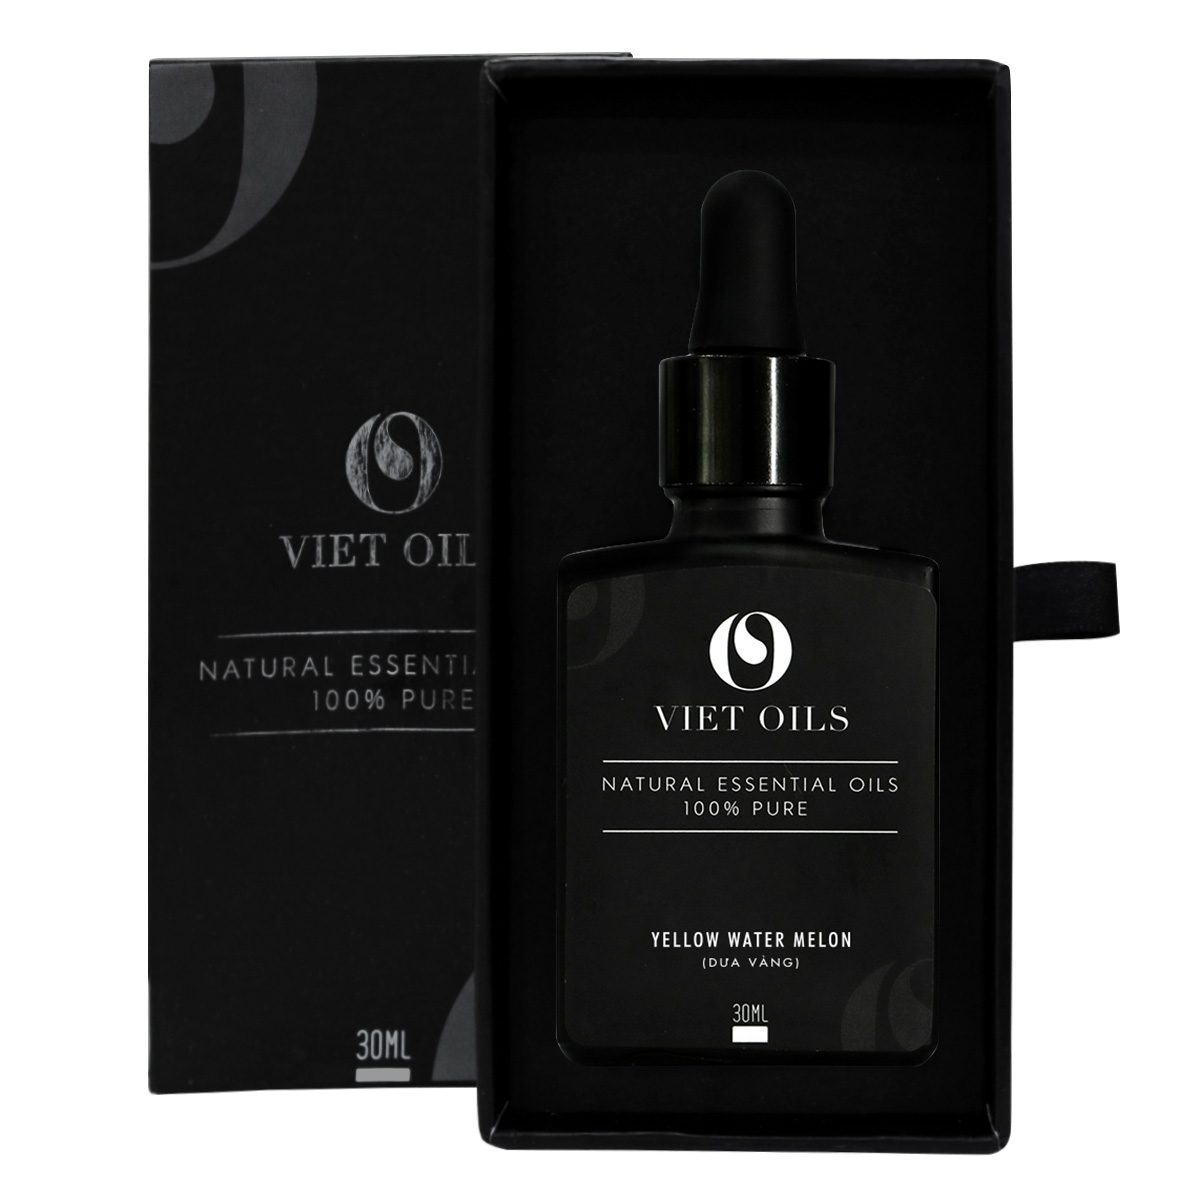 Tinh Dầu Dưa Vàng Viet Oils 30ml